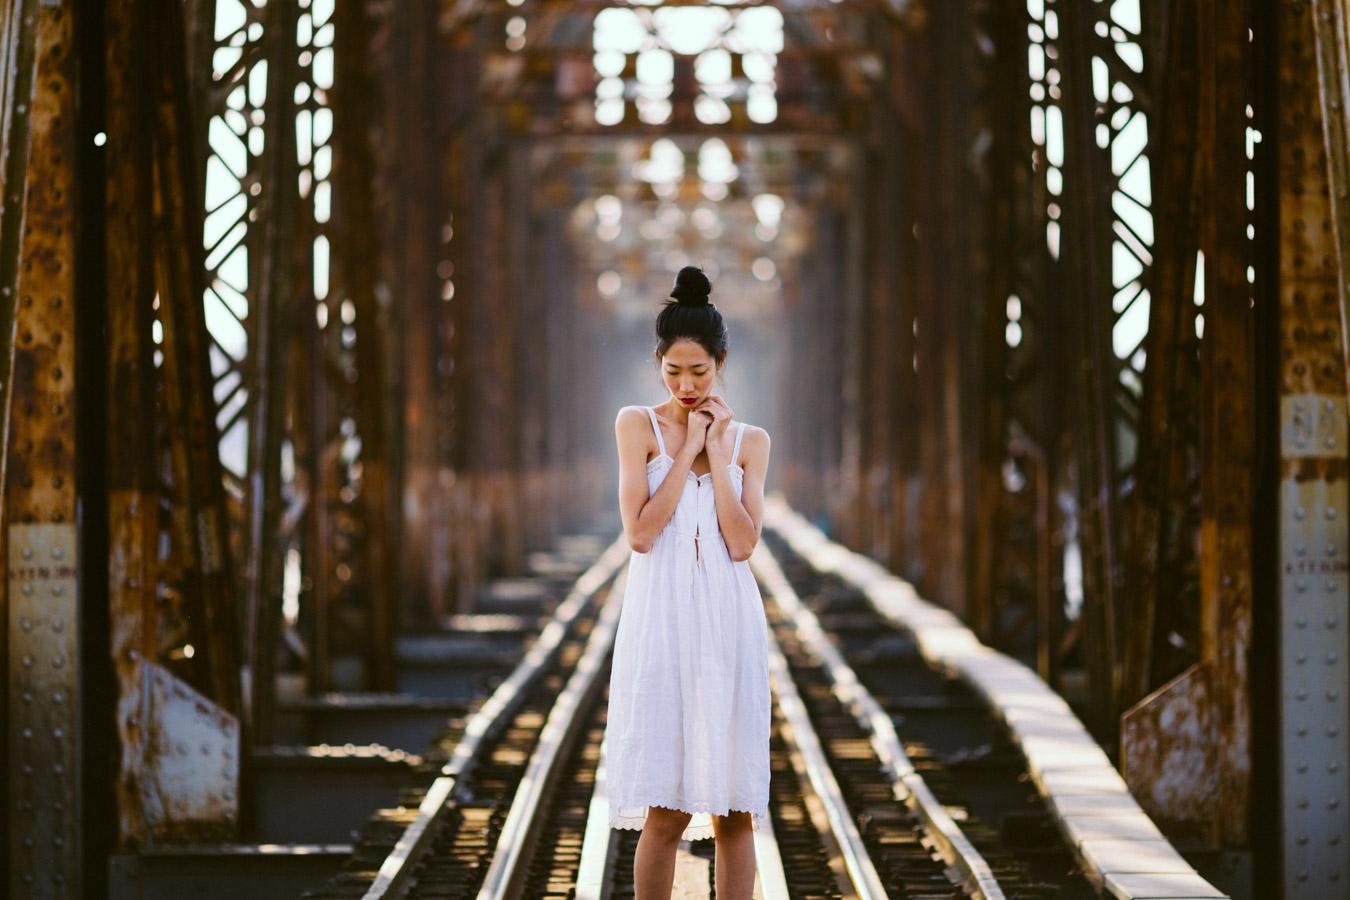 Asia-Fashion-Photographer-33-1.jpg